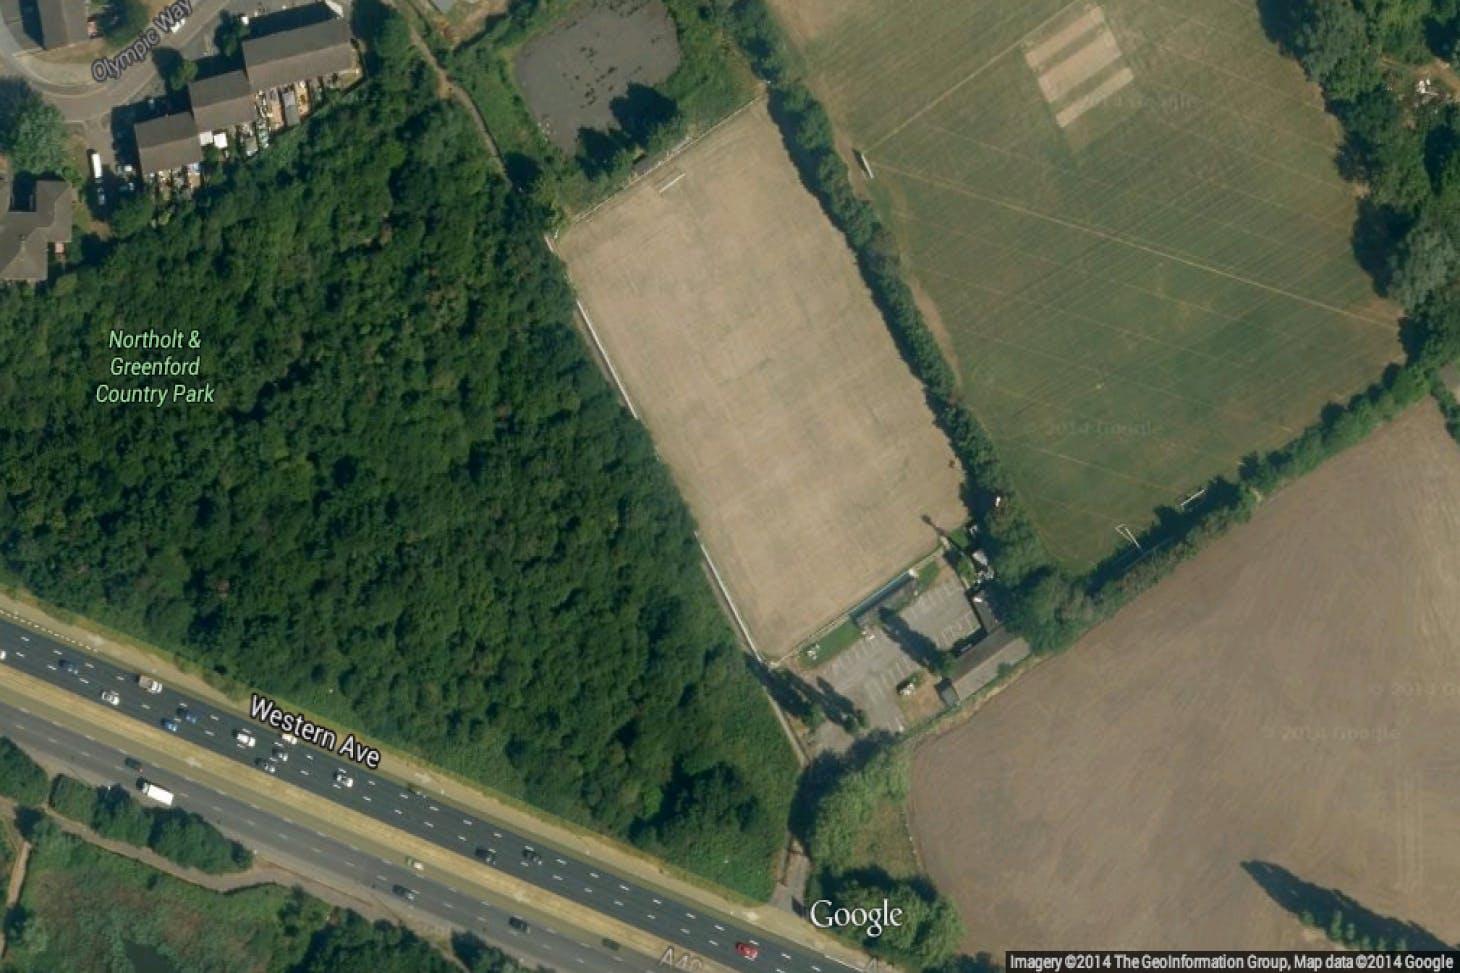 London Marathon Playing Fields - Greenford 5 a side | Grass football pitch